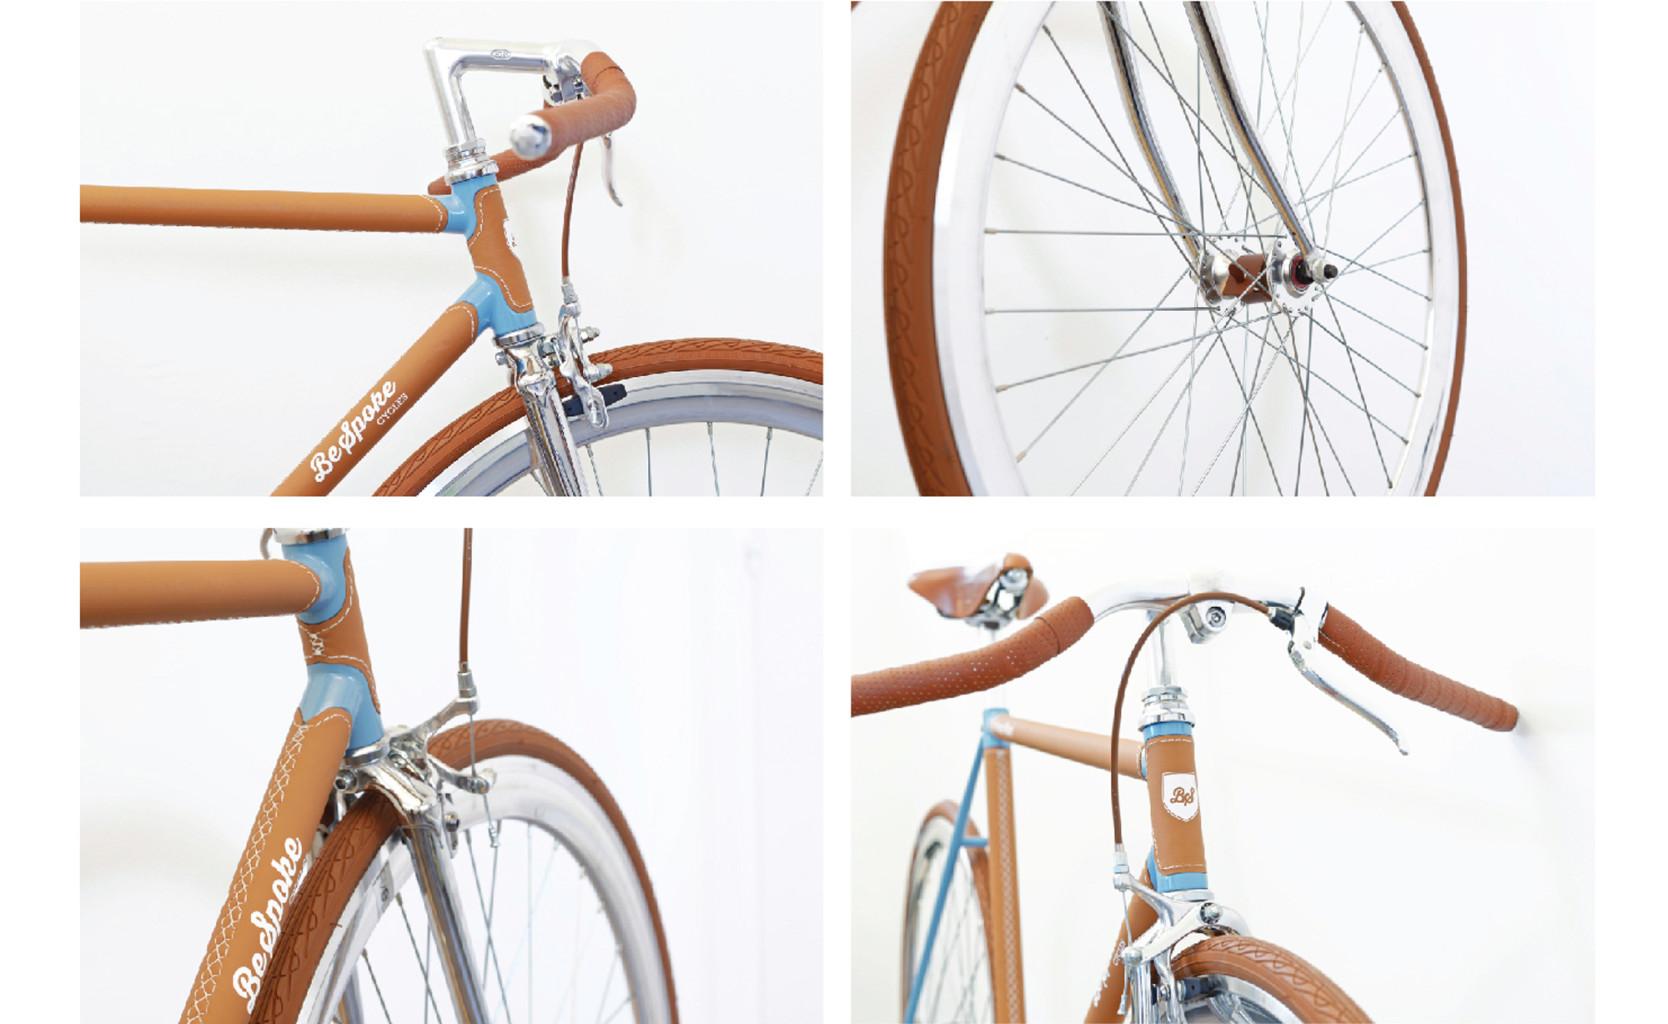 Bespoke bike 30